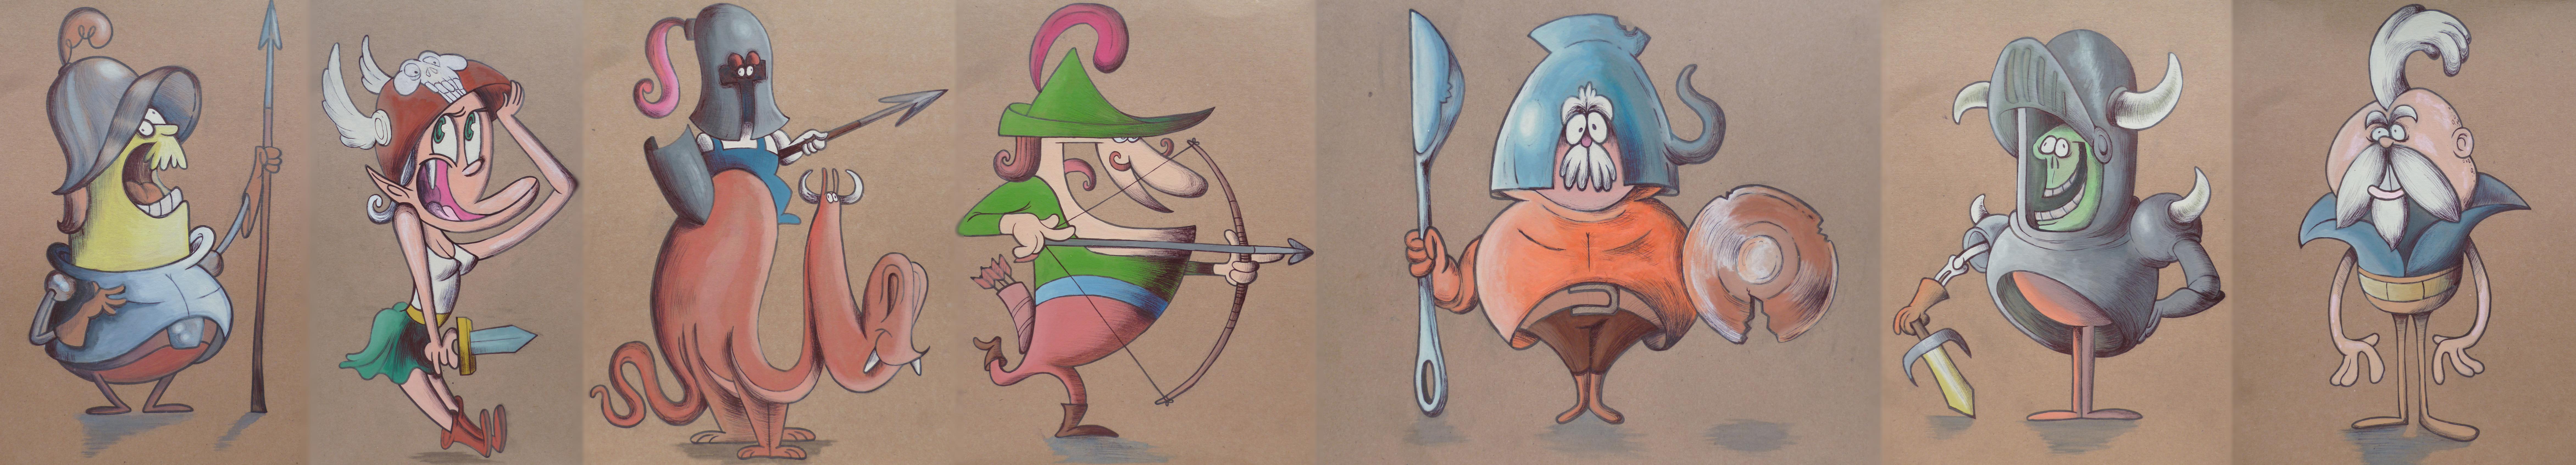 Watercolour warriors